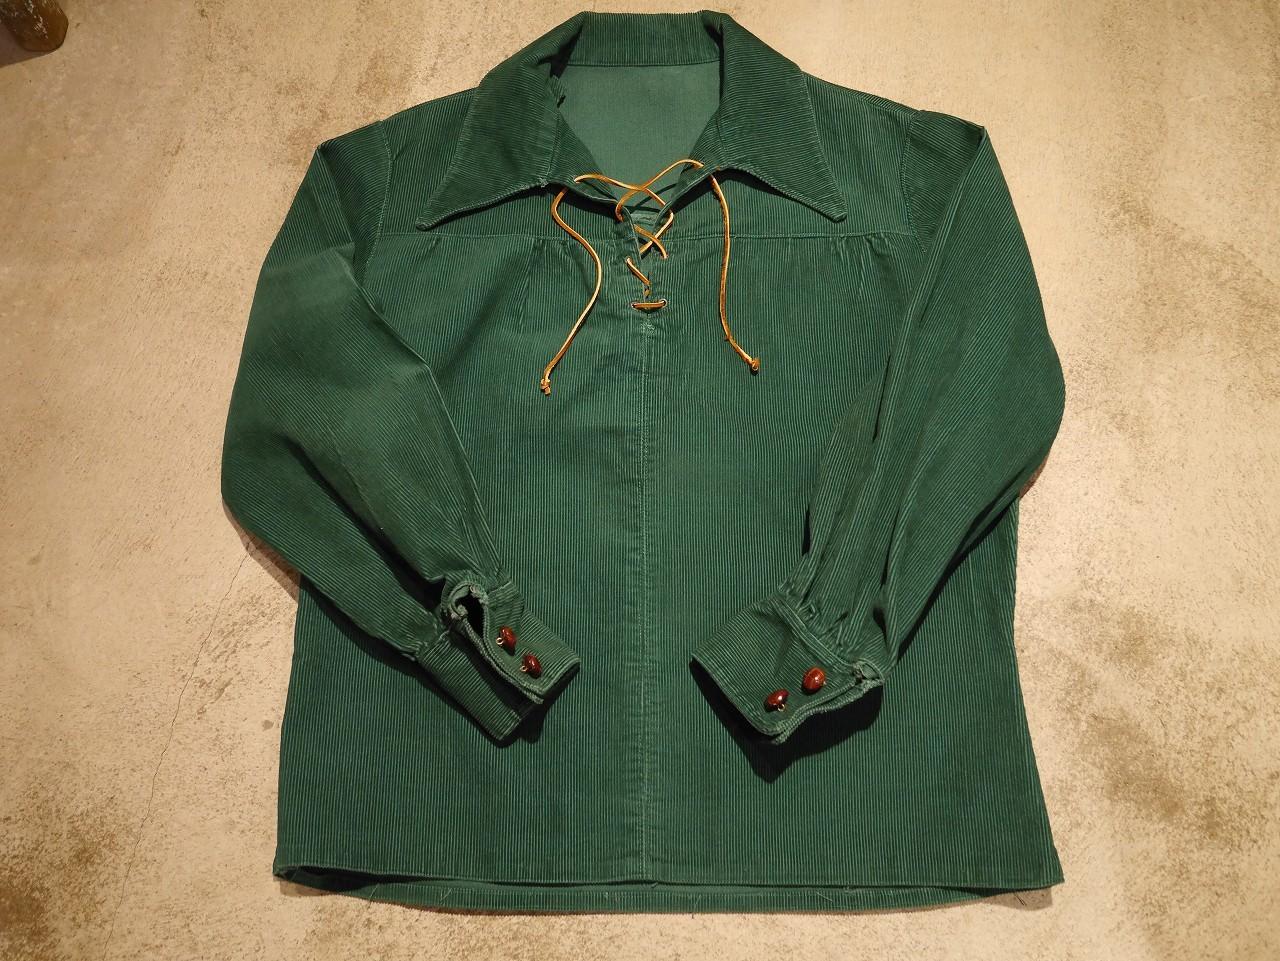 1970's Corduroy Lace Up Shirt!! - BAYSON BLOG